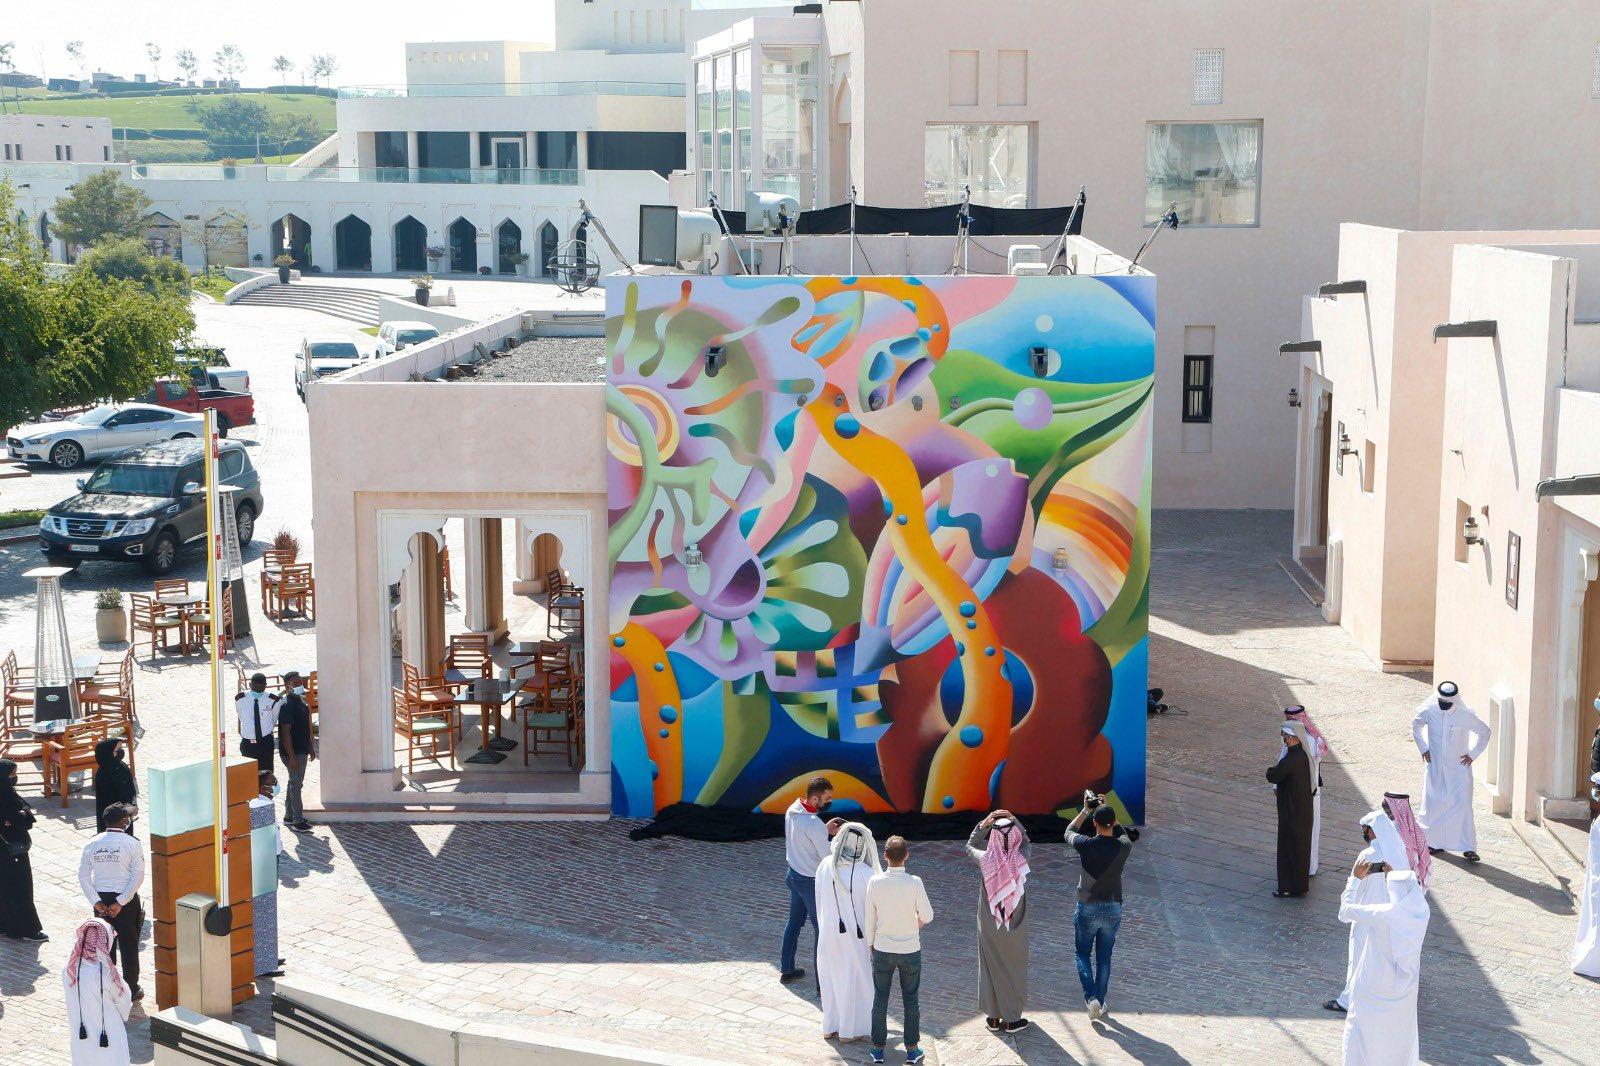 Late Qatari artist Wafa's murals unveiled at Katara